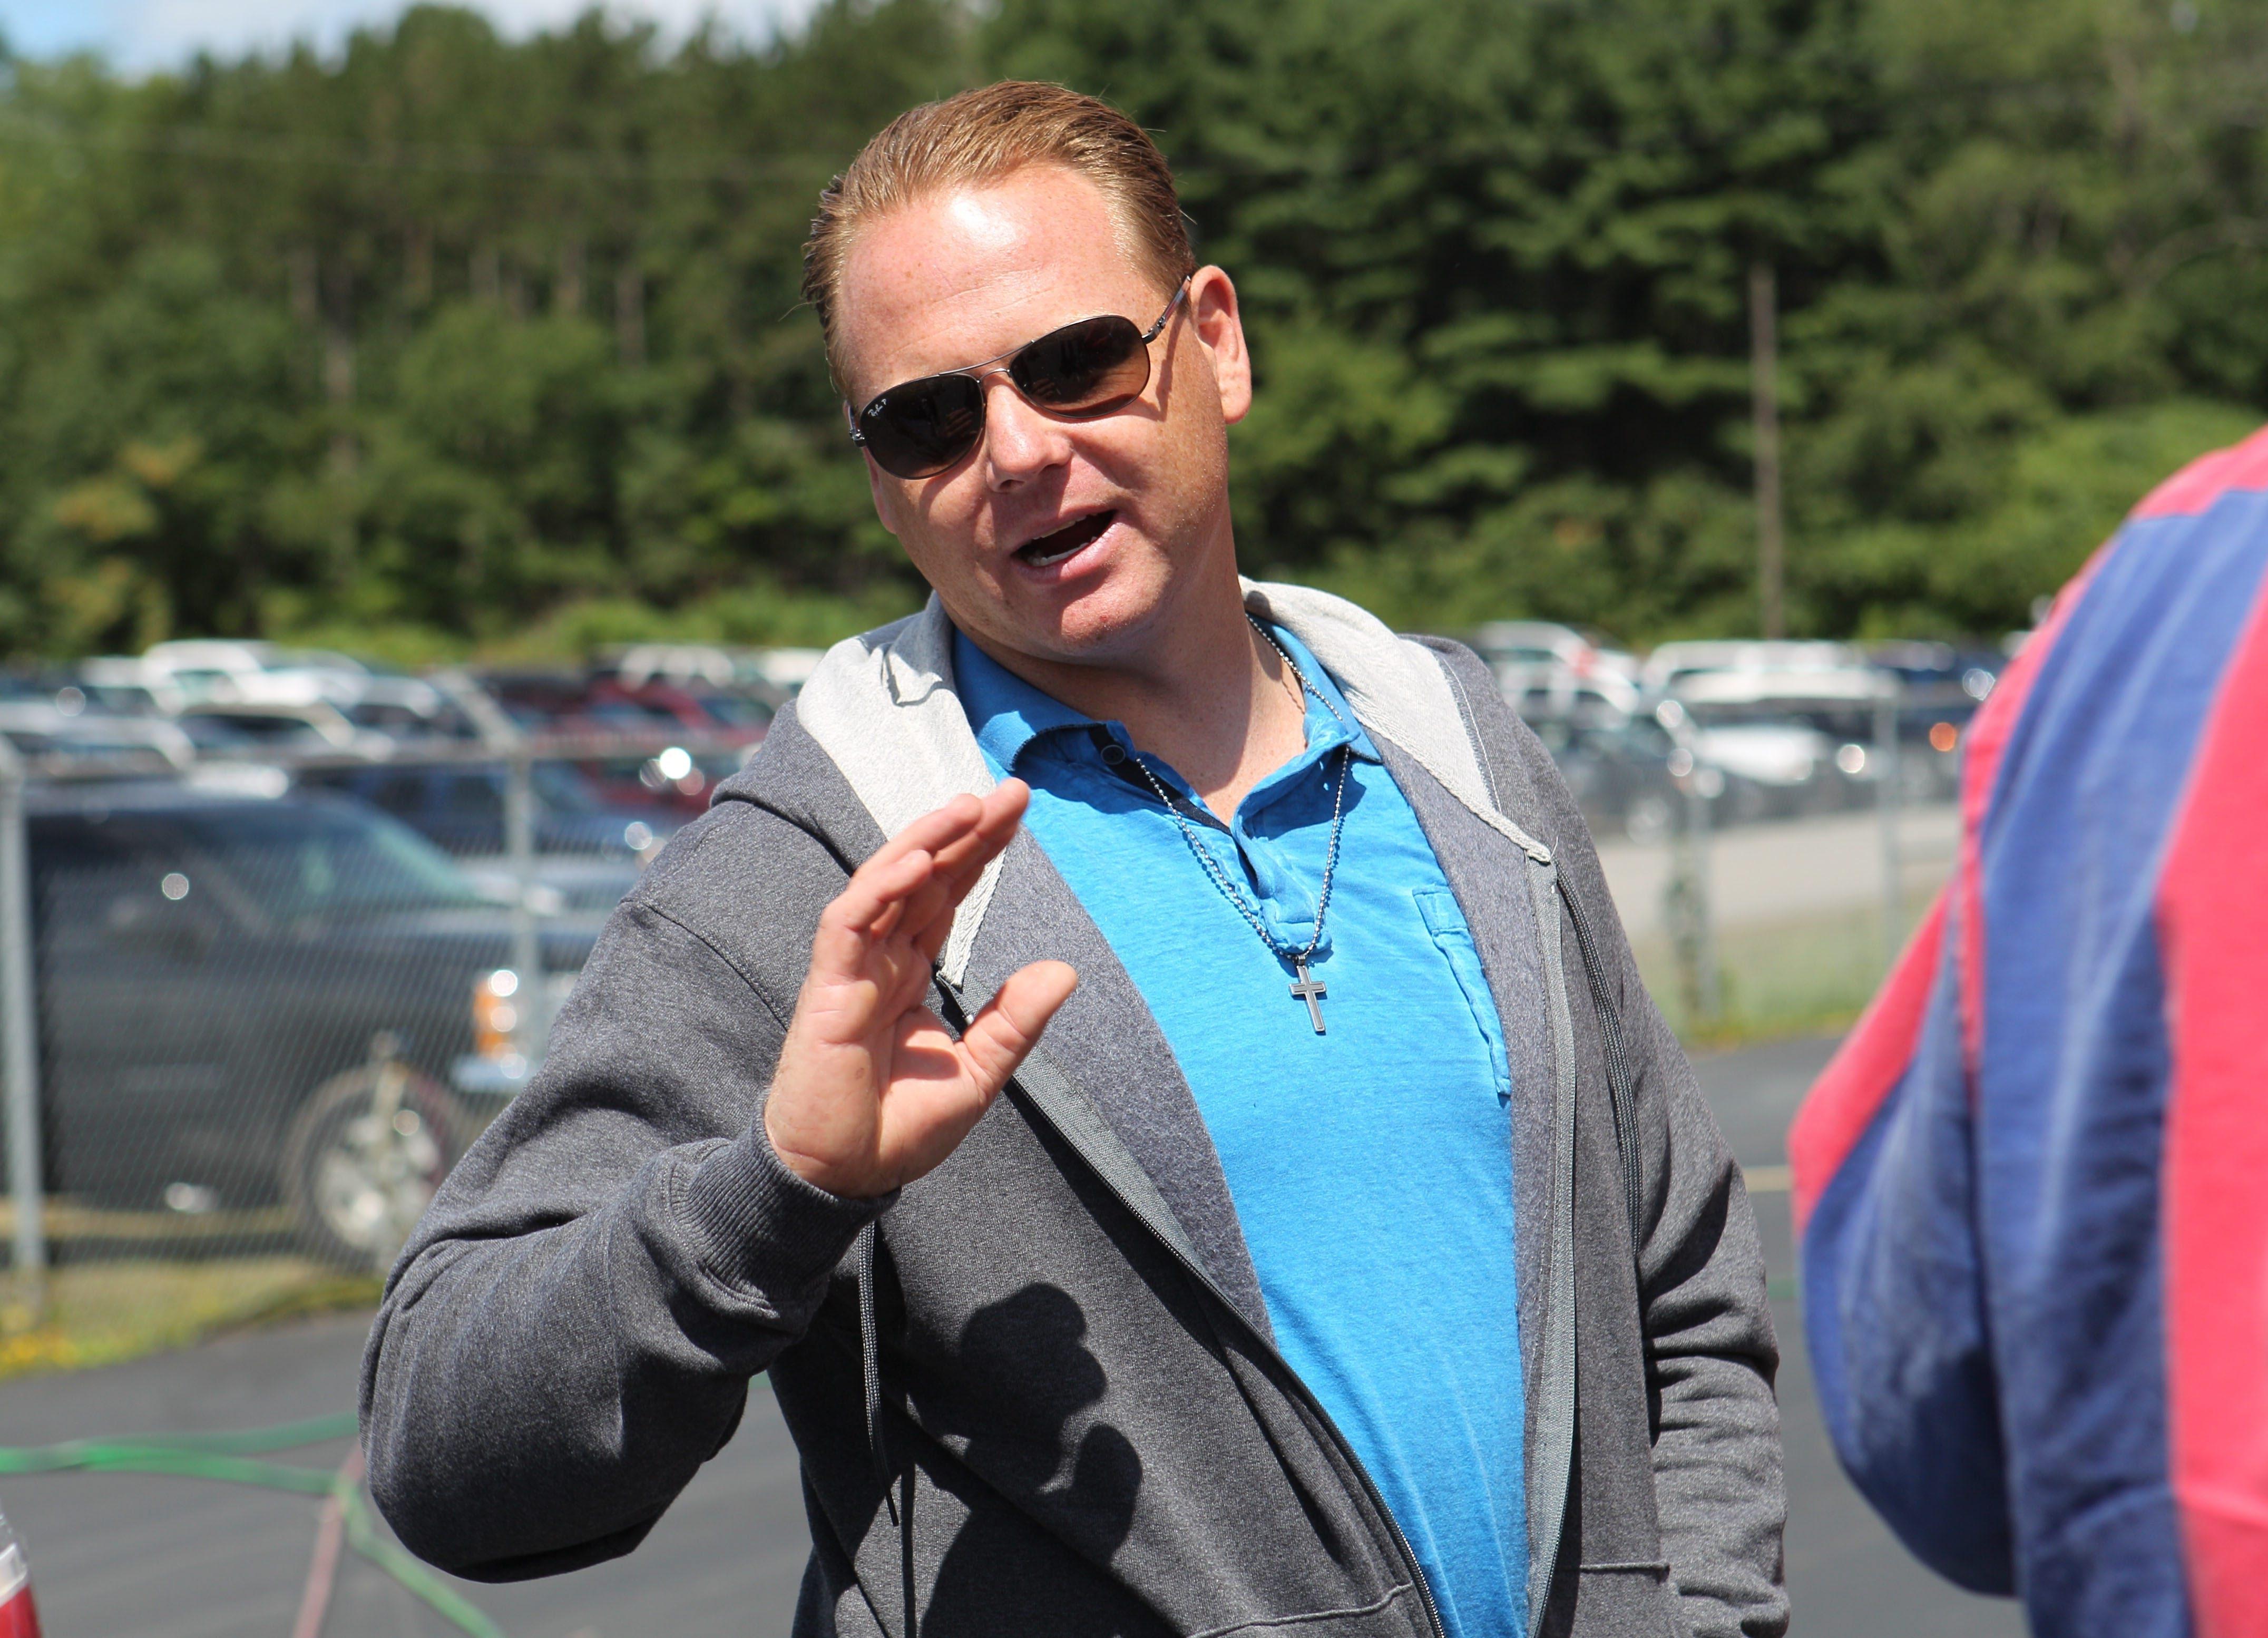 Nik Wallenda promises that something new is planned for Darien Lake on Saturday.